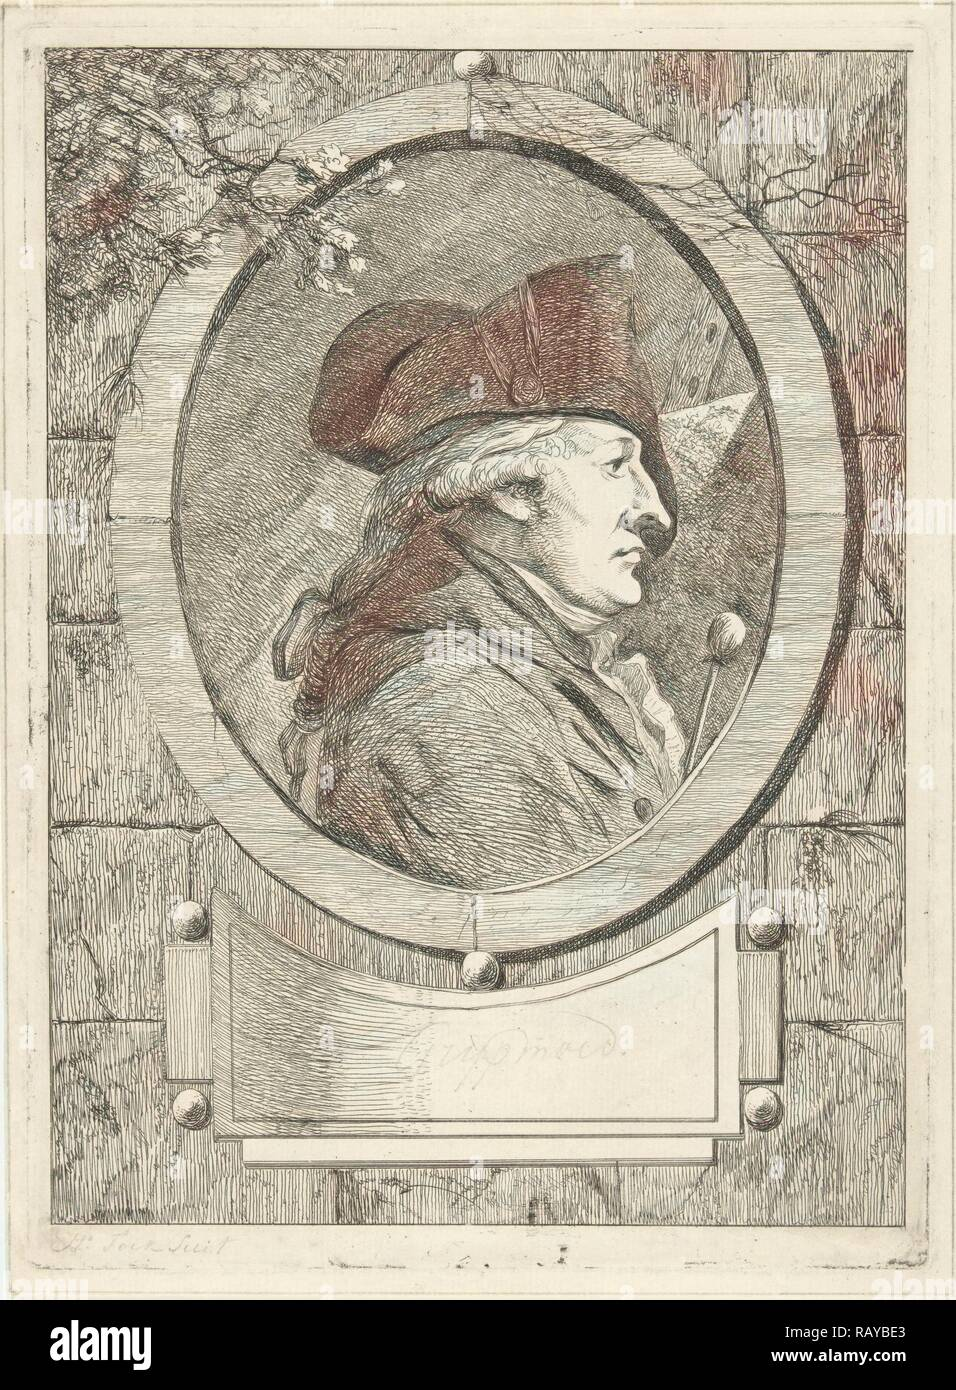 Portrait of Geerlig Grijpmoed, Hermanus Fock, 1781 - 1822. Reimagined by Gibon. Classic art with a modern twist reimagined - Stock Image